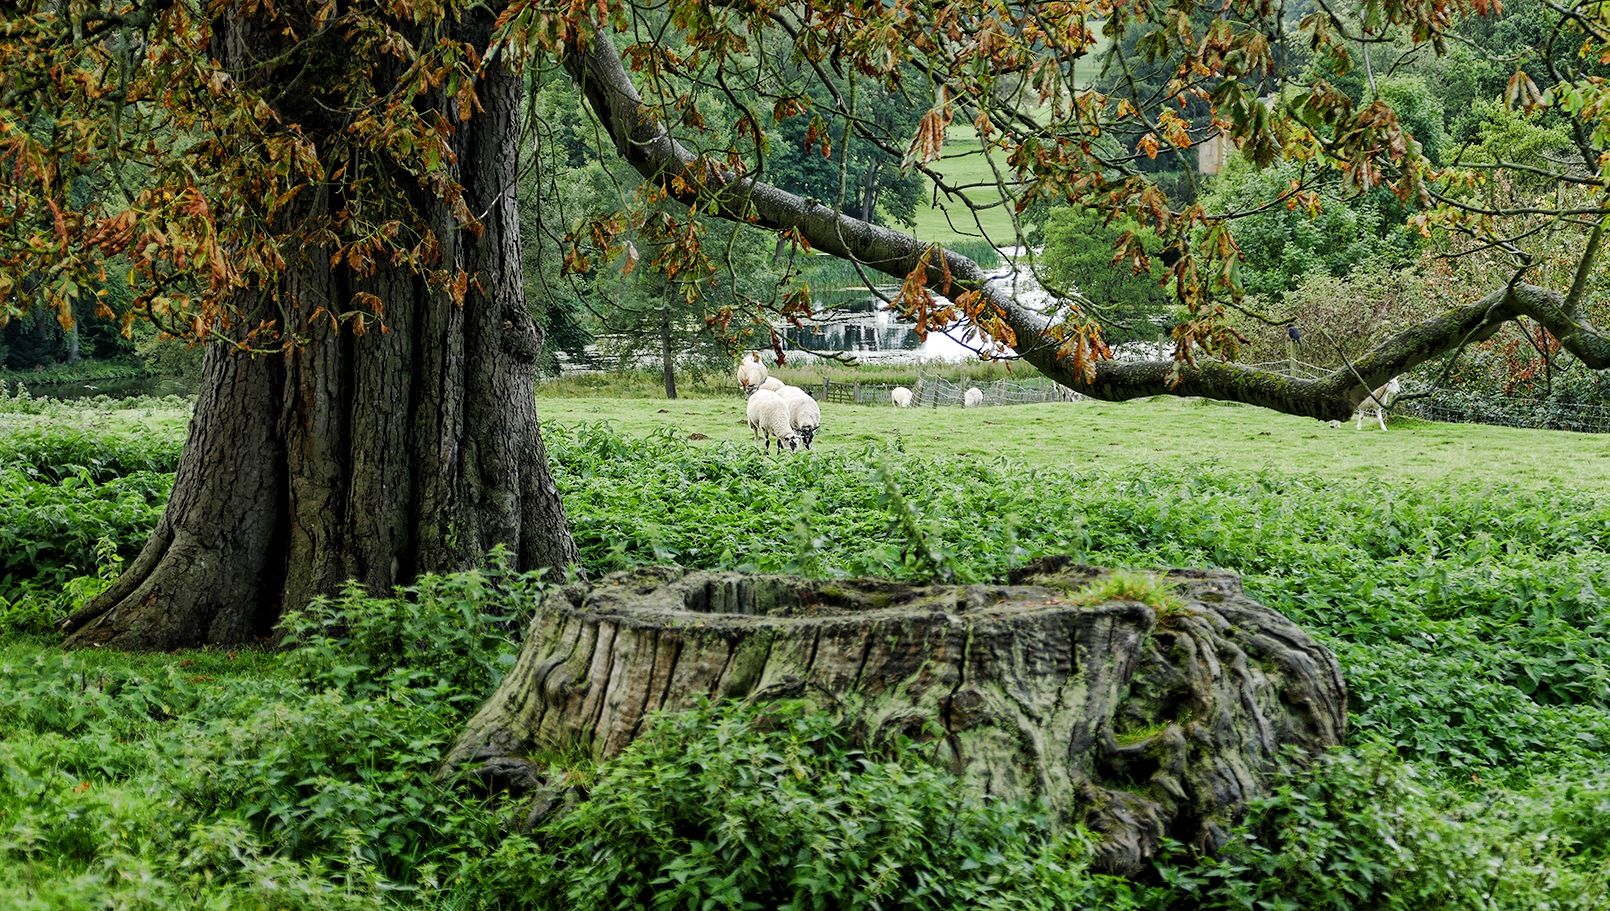 Grazing Sheep by Steven Iodice